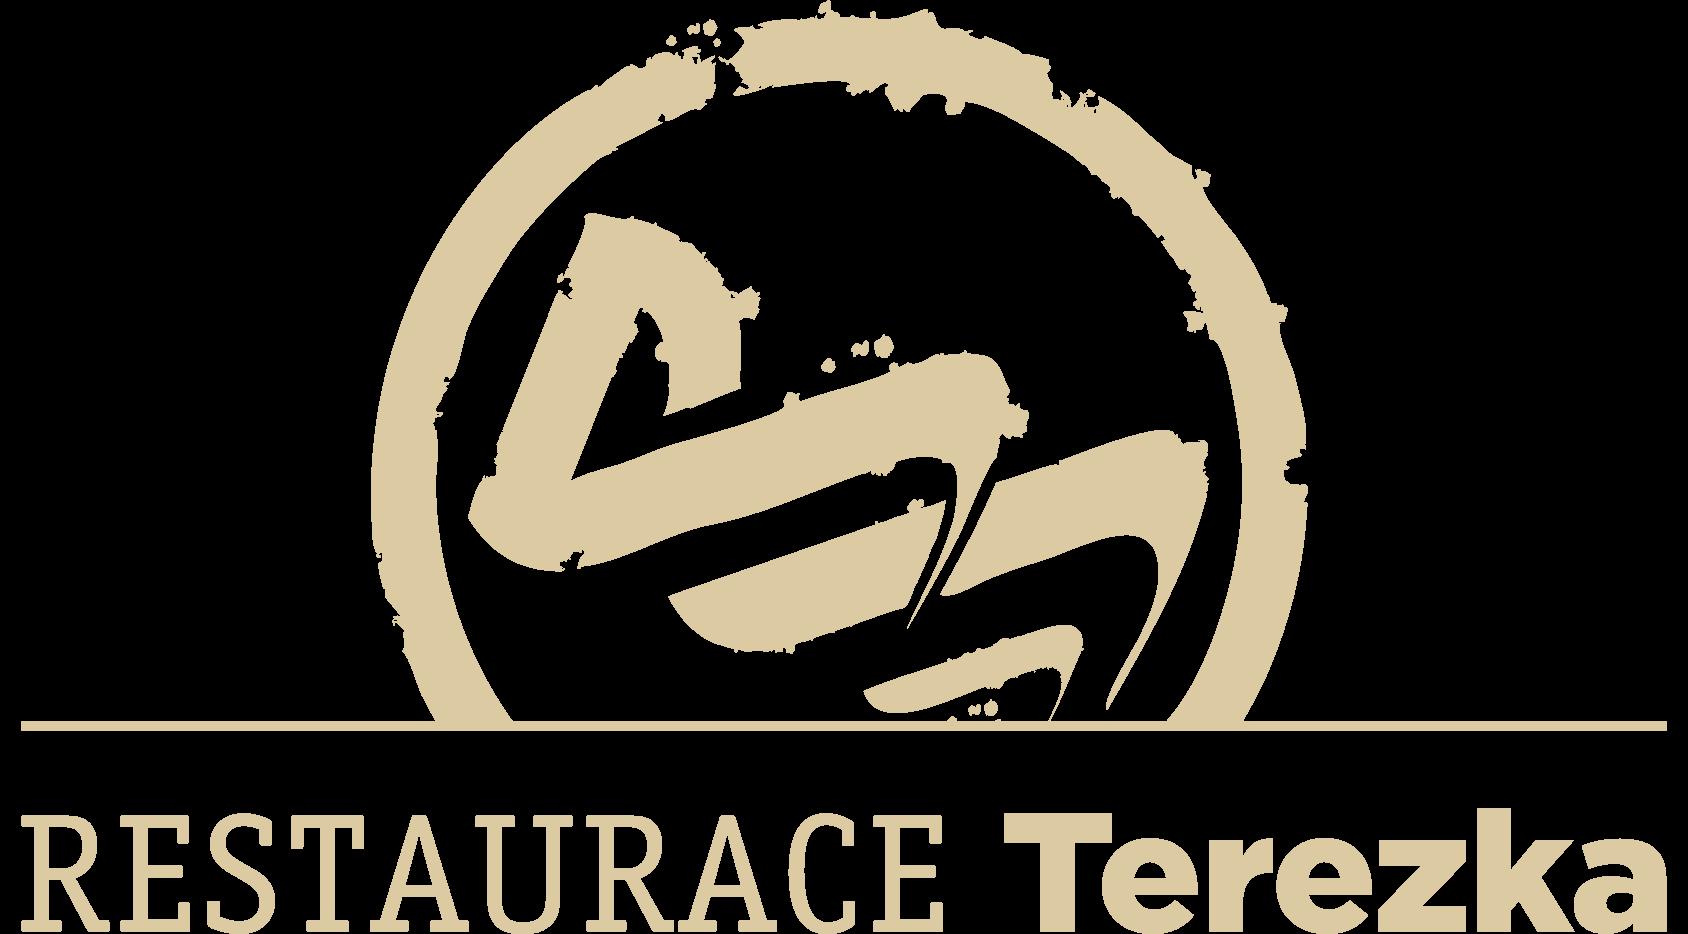 Terezka logo